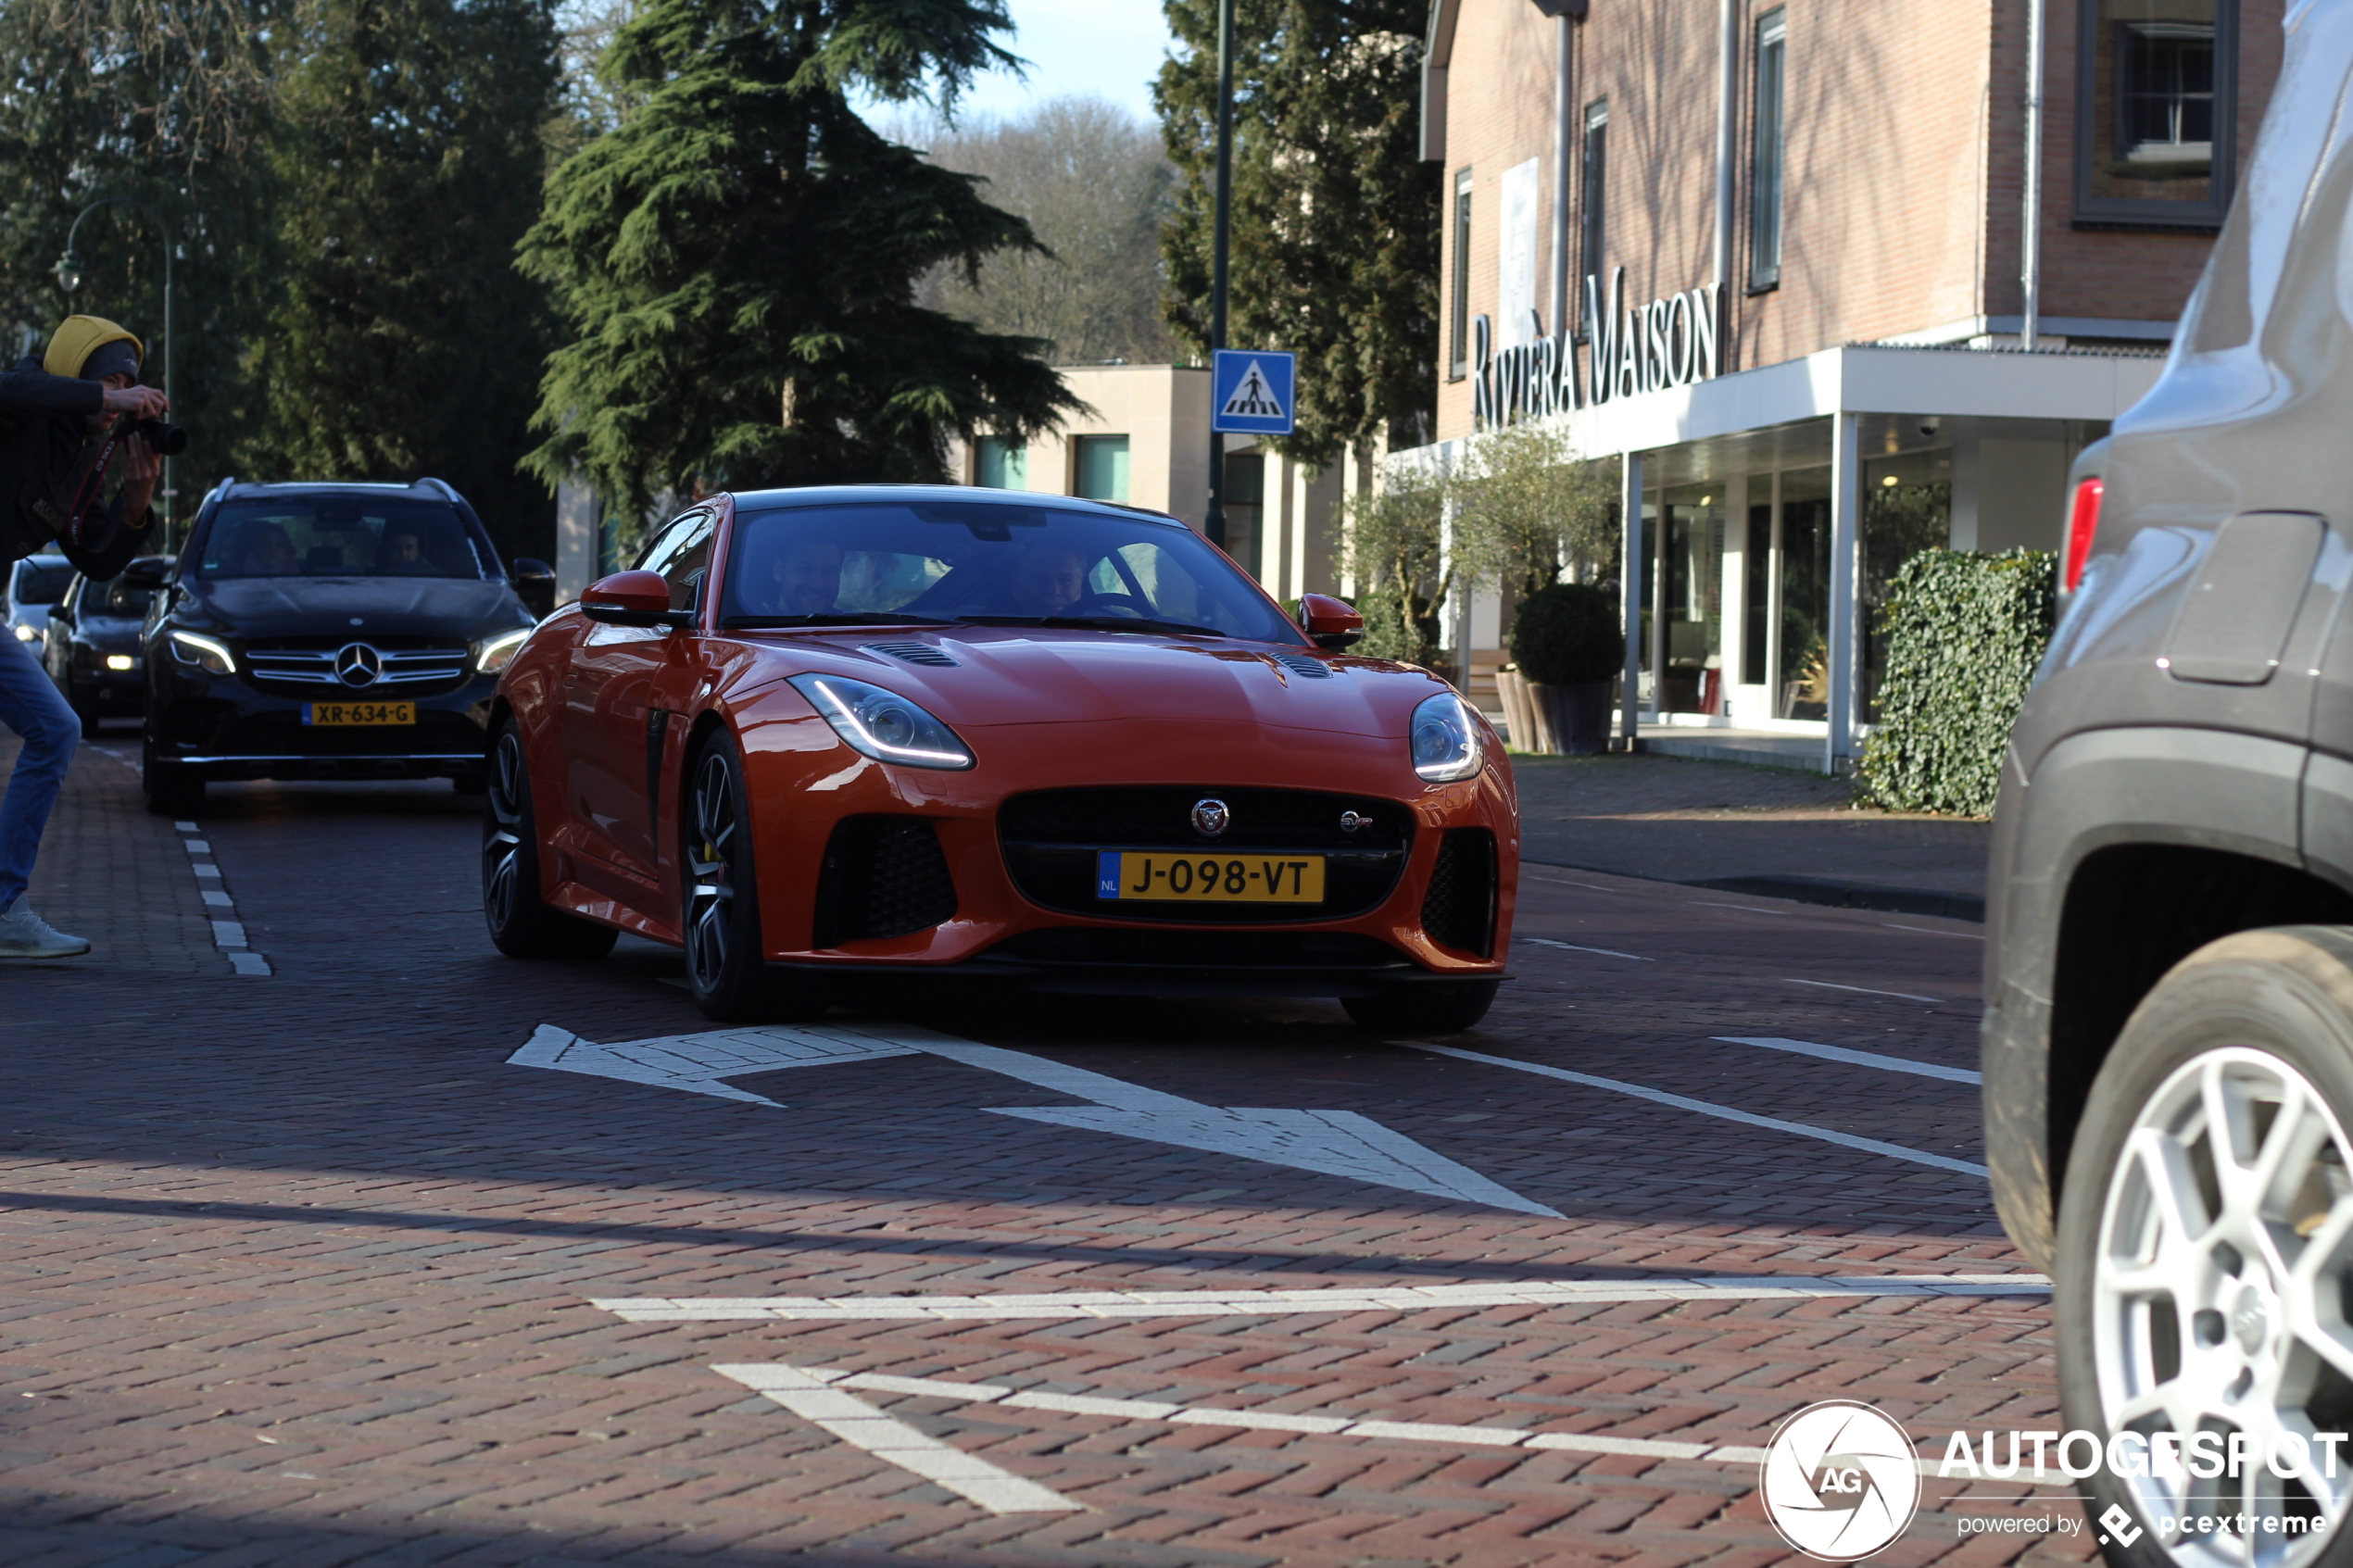 Stoer! Nieuwe Jaguar F-TYPE SVR in Nederland